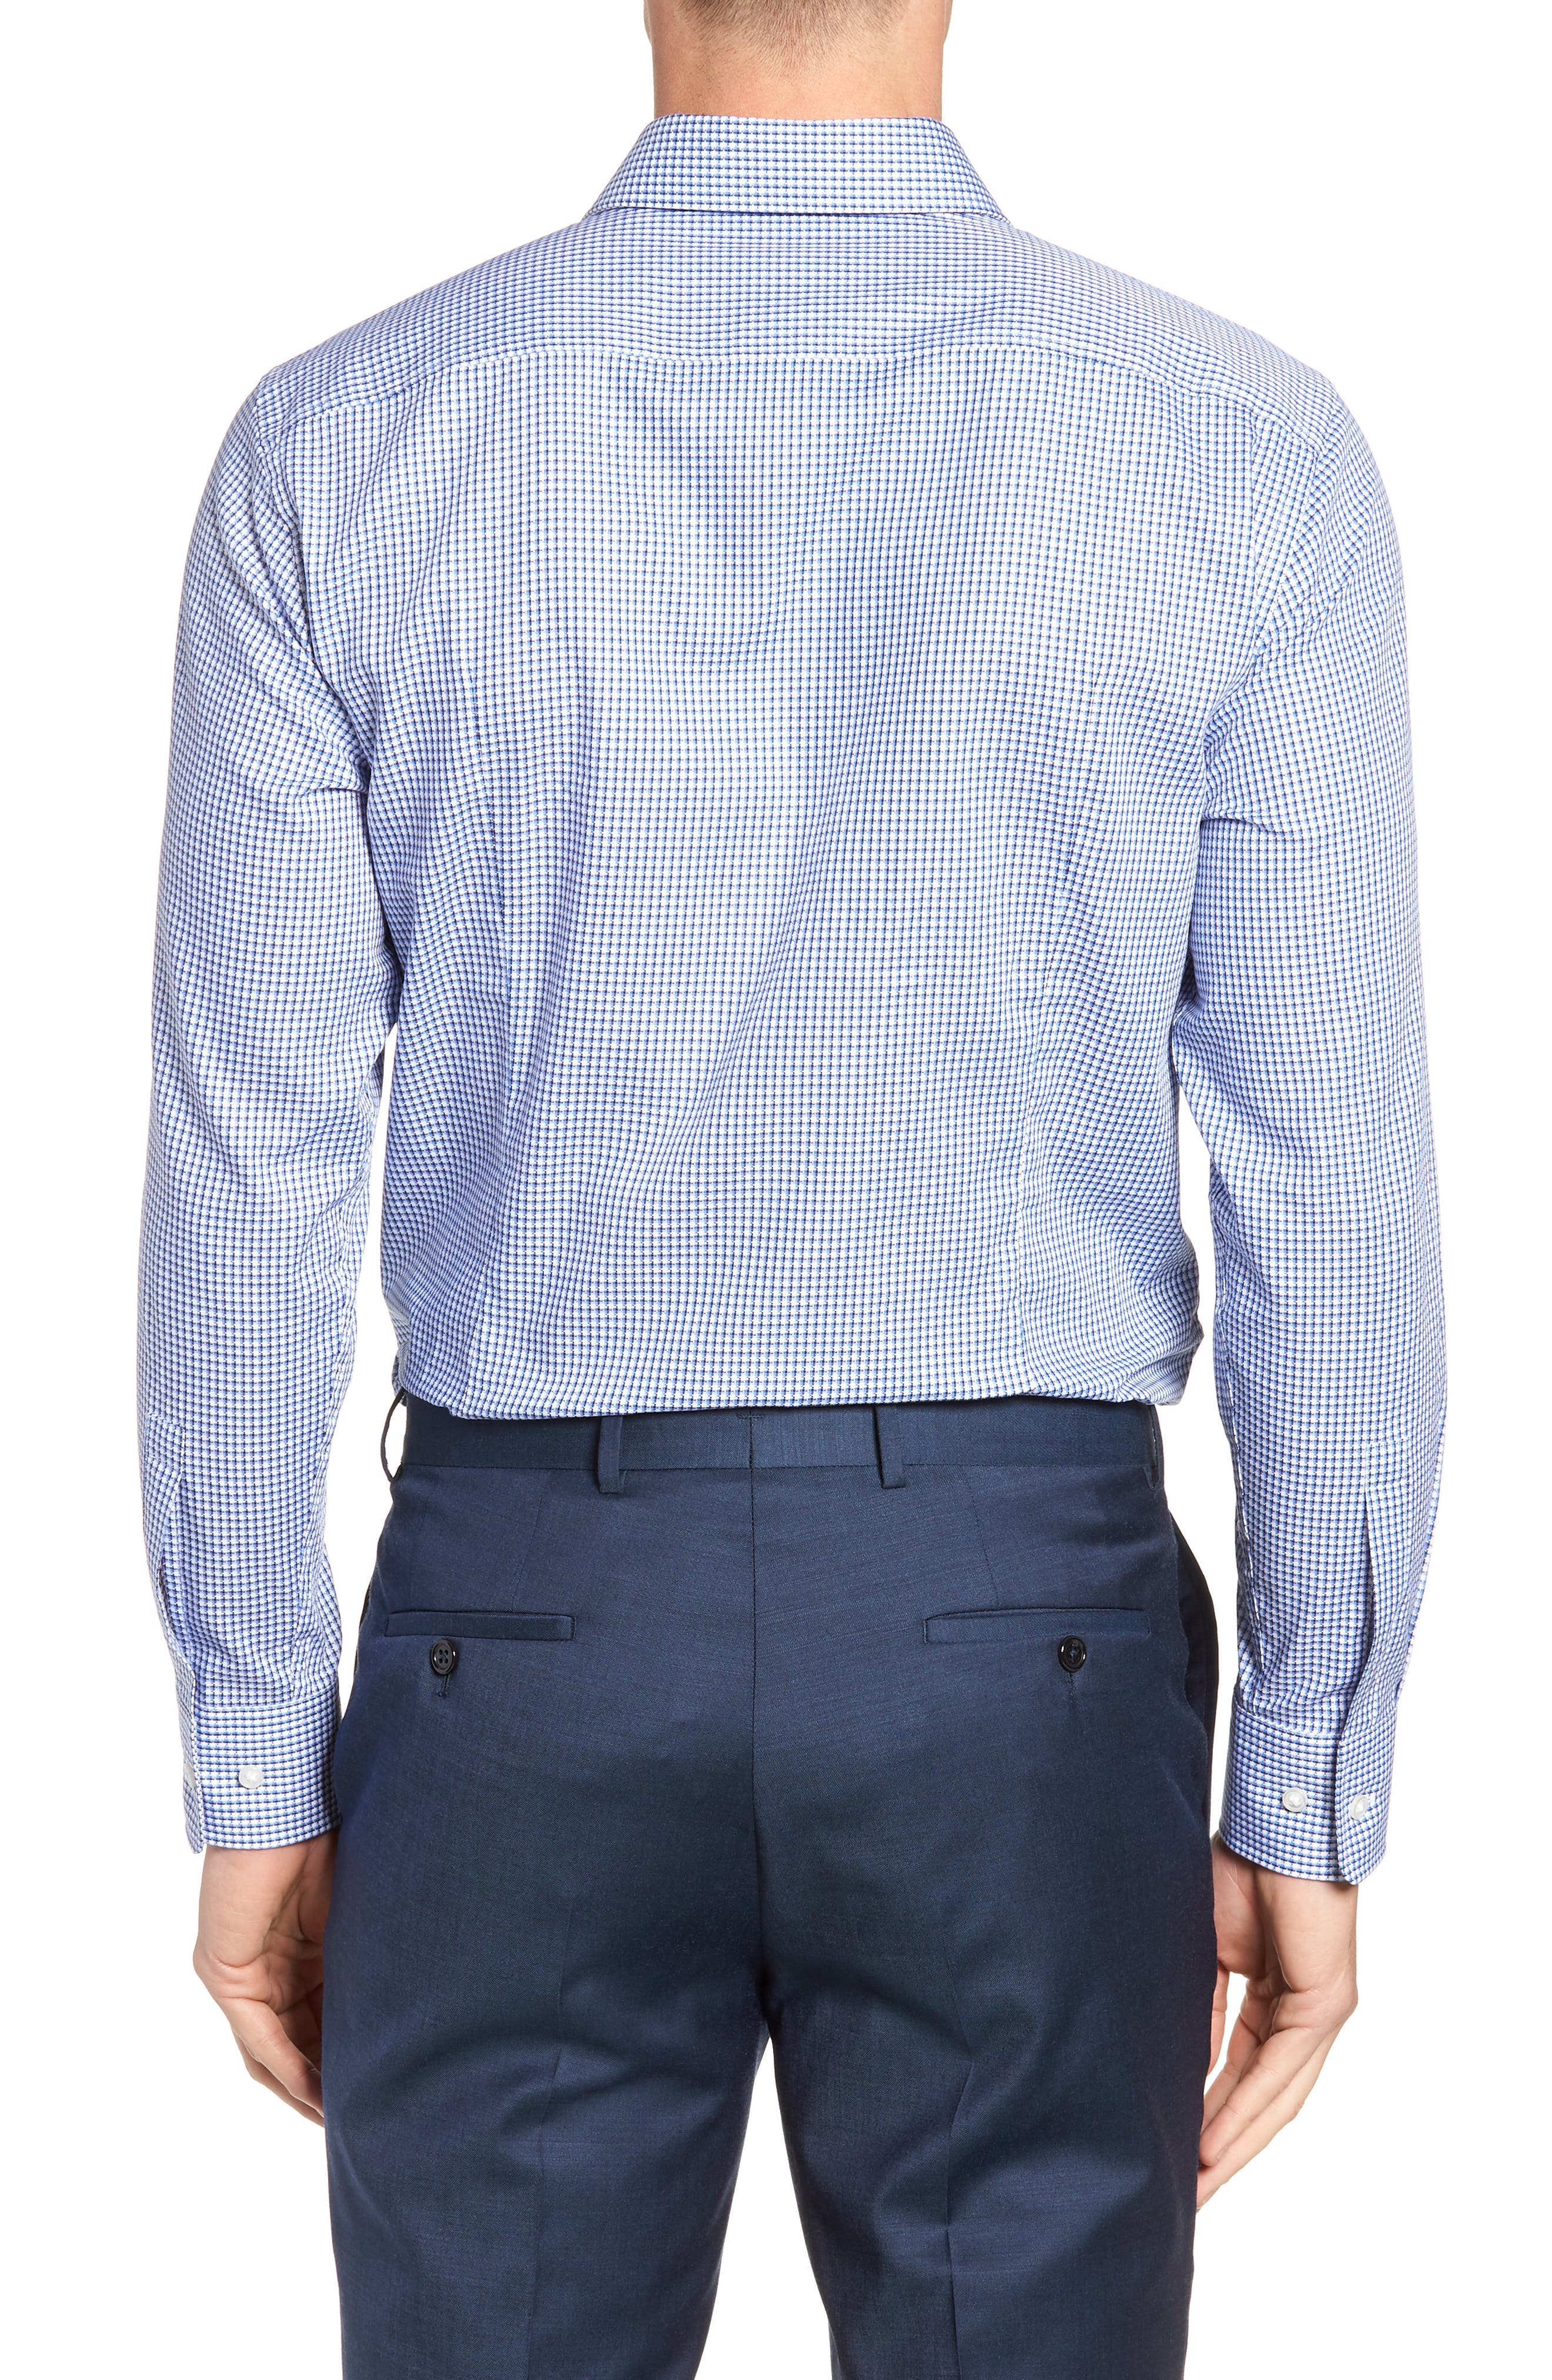 Mark Sharp Fit Check Dress Shirt,                             Alternate thumbnail 3, color,                             BLUE